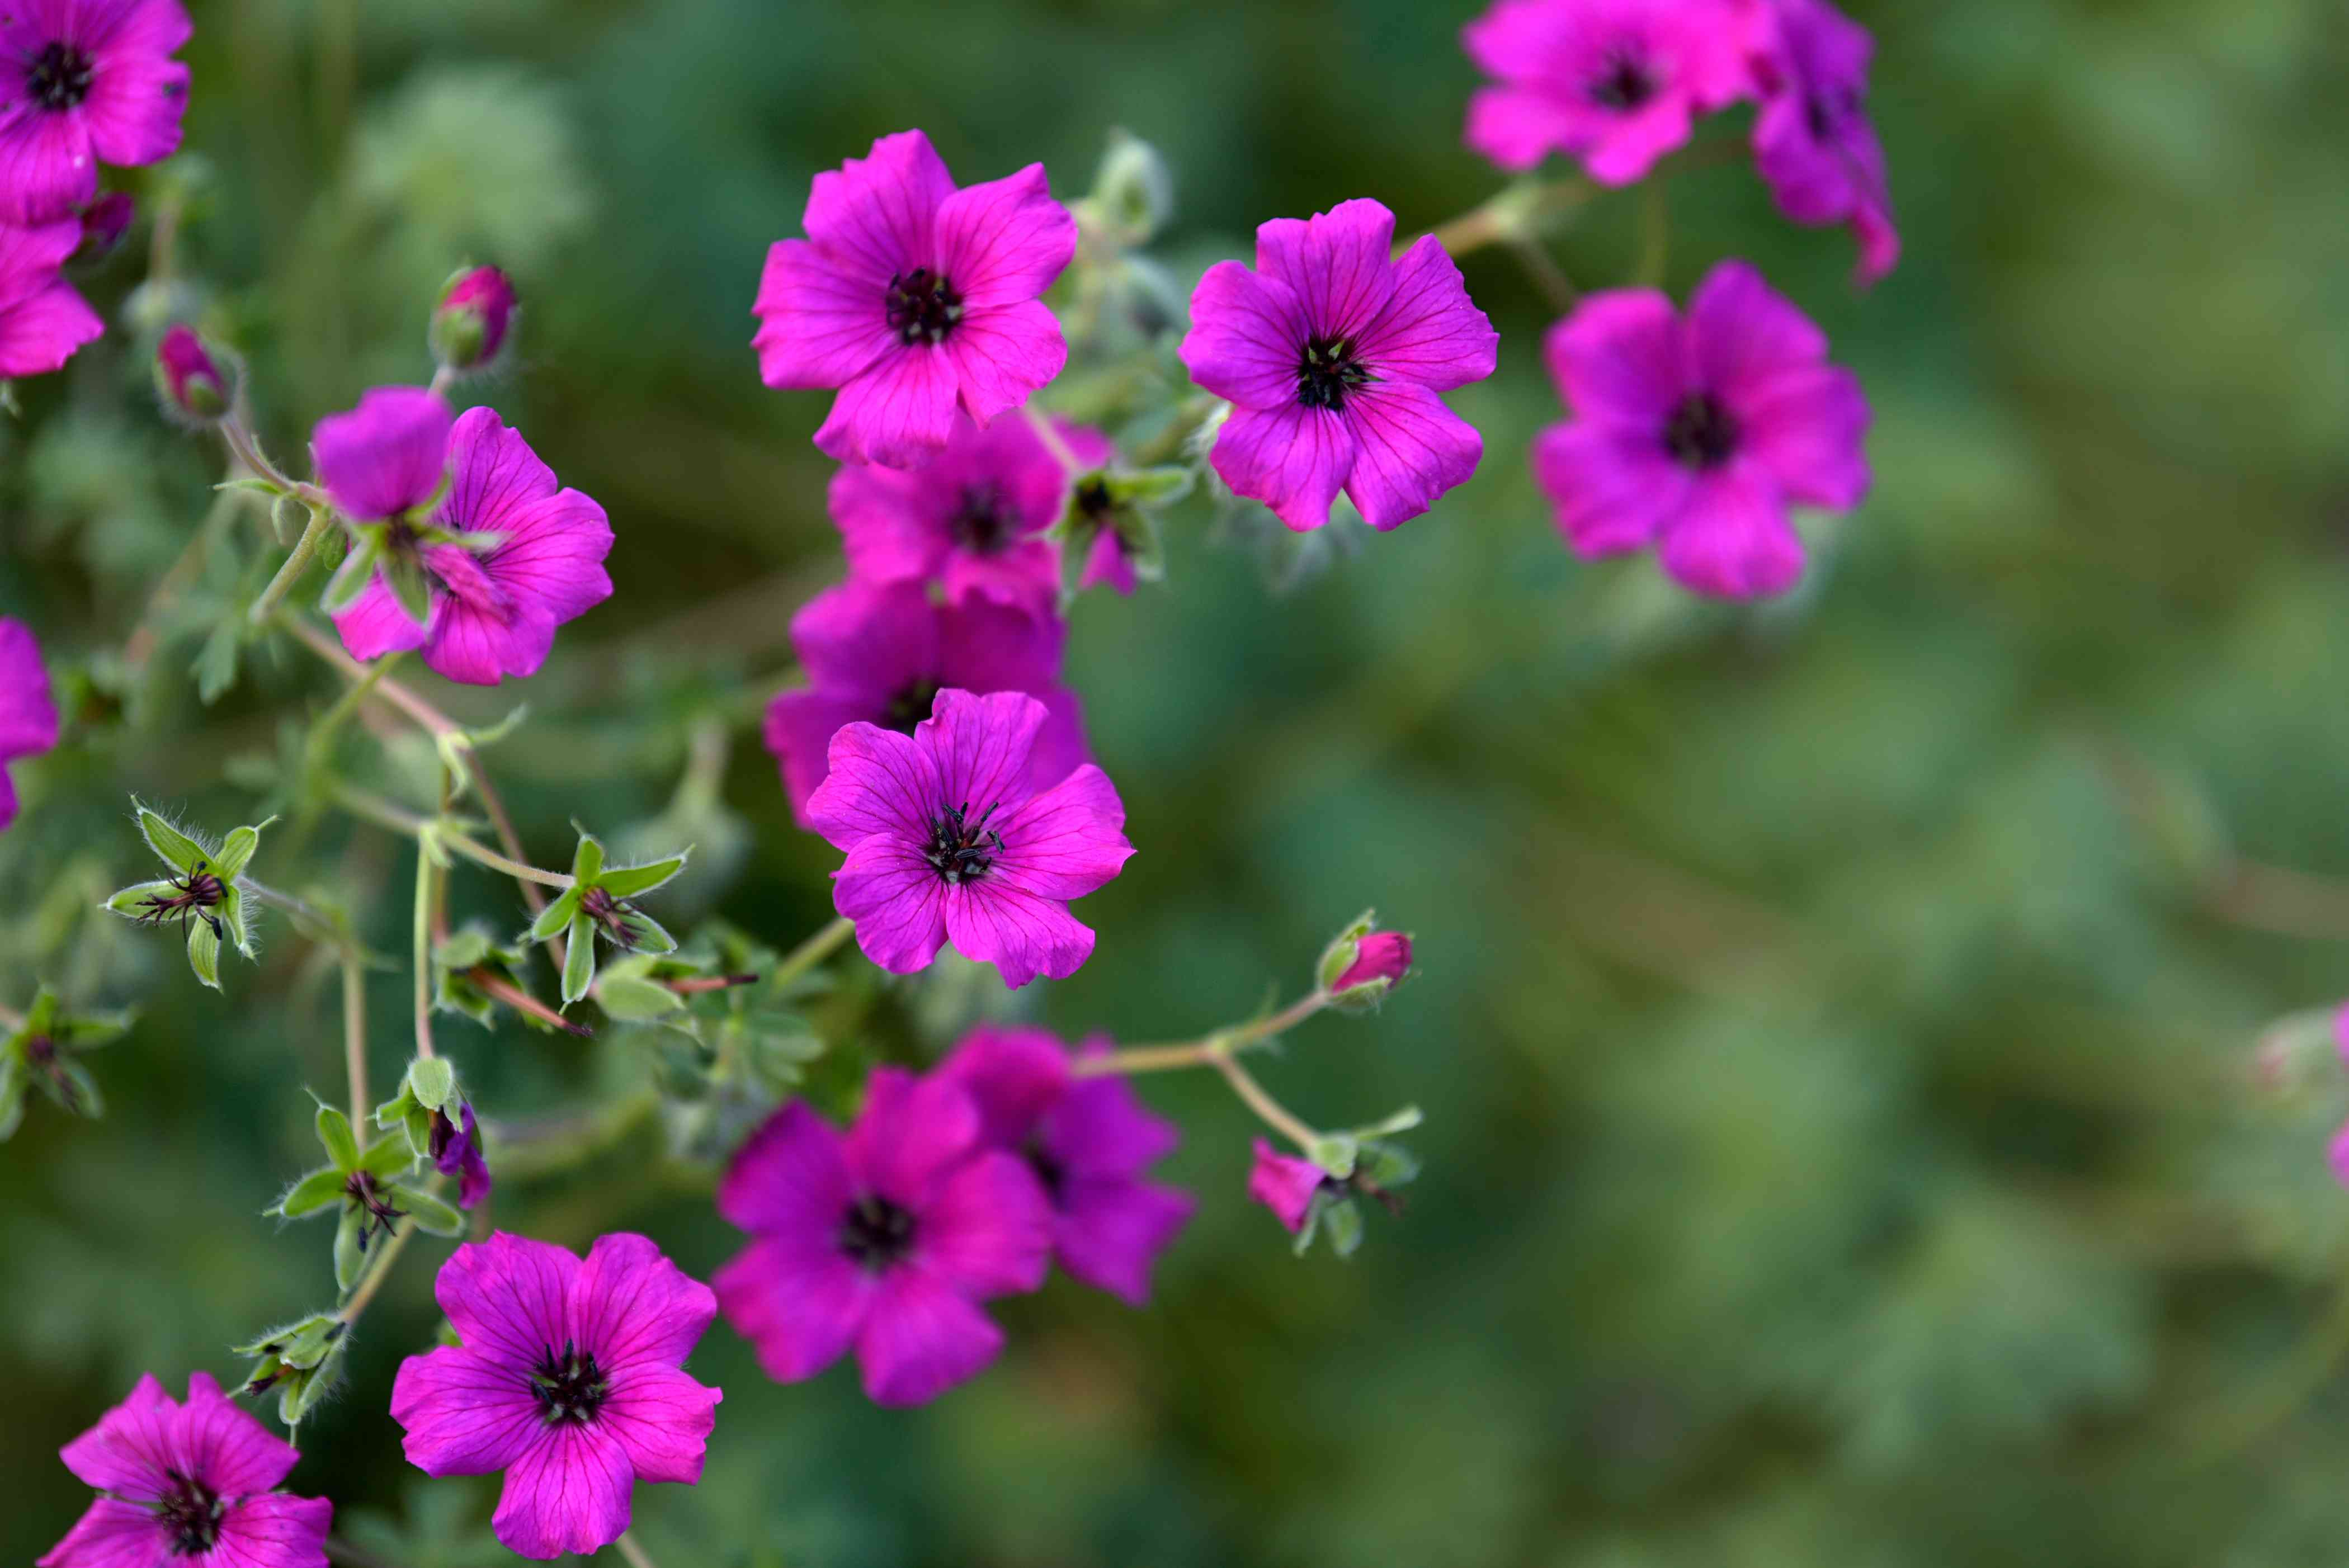 Hardy 'Ann Folkard' geranium plant stems with fuchsia-colored flowers and buds closeup